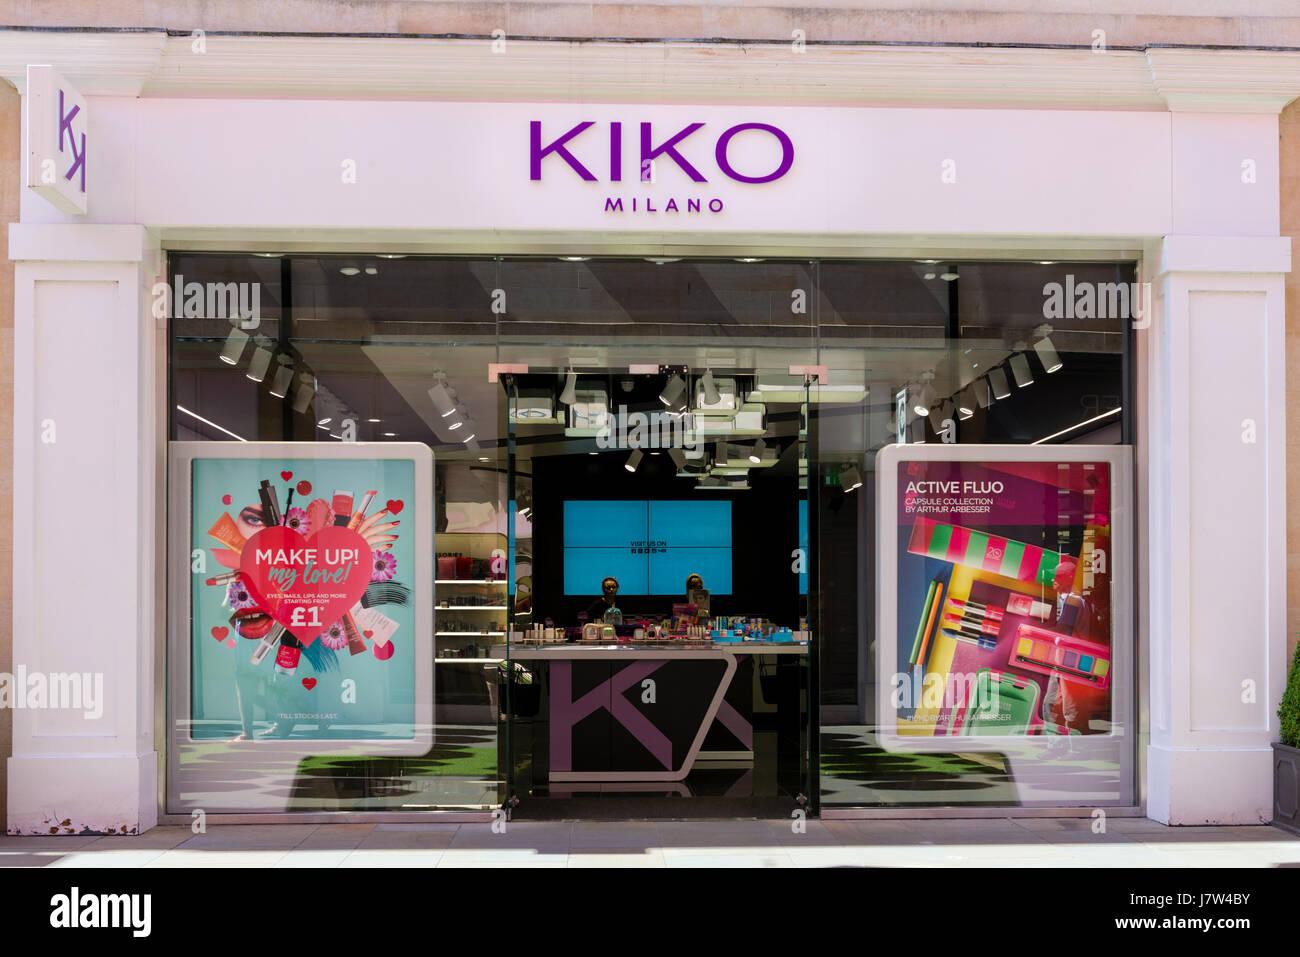 Kiko Milano store, UK. Stock Photo